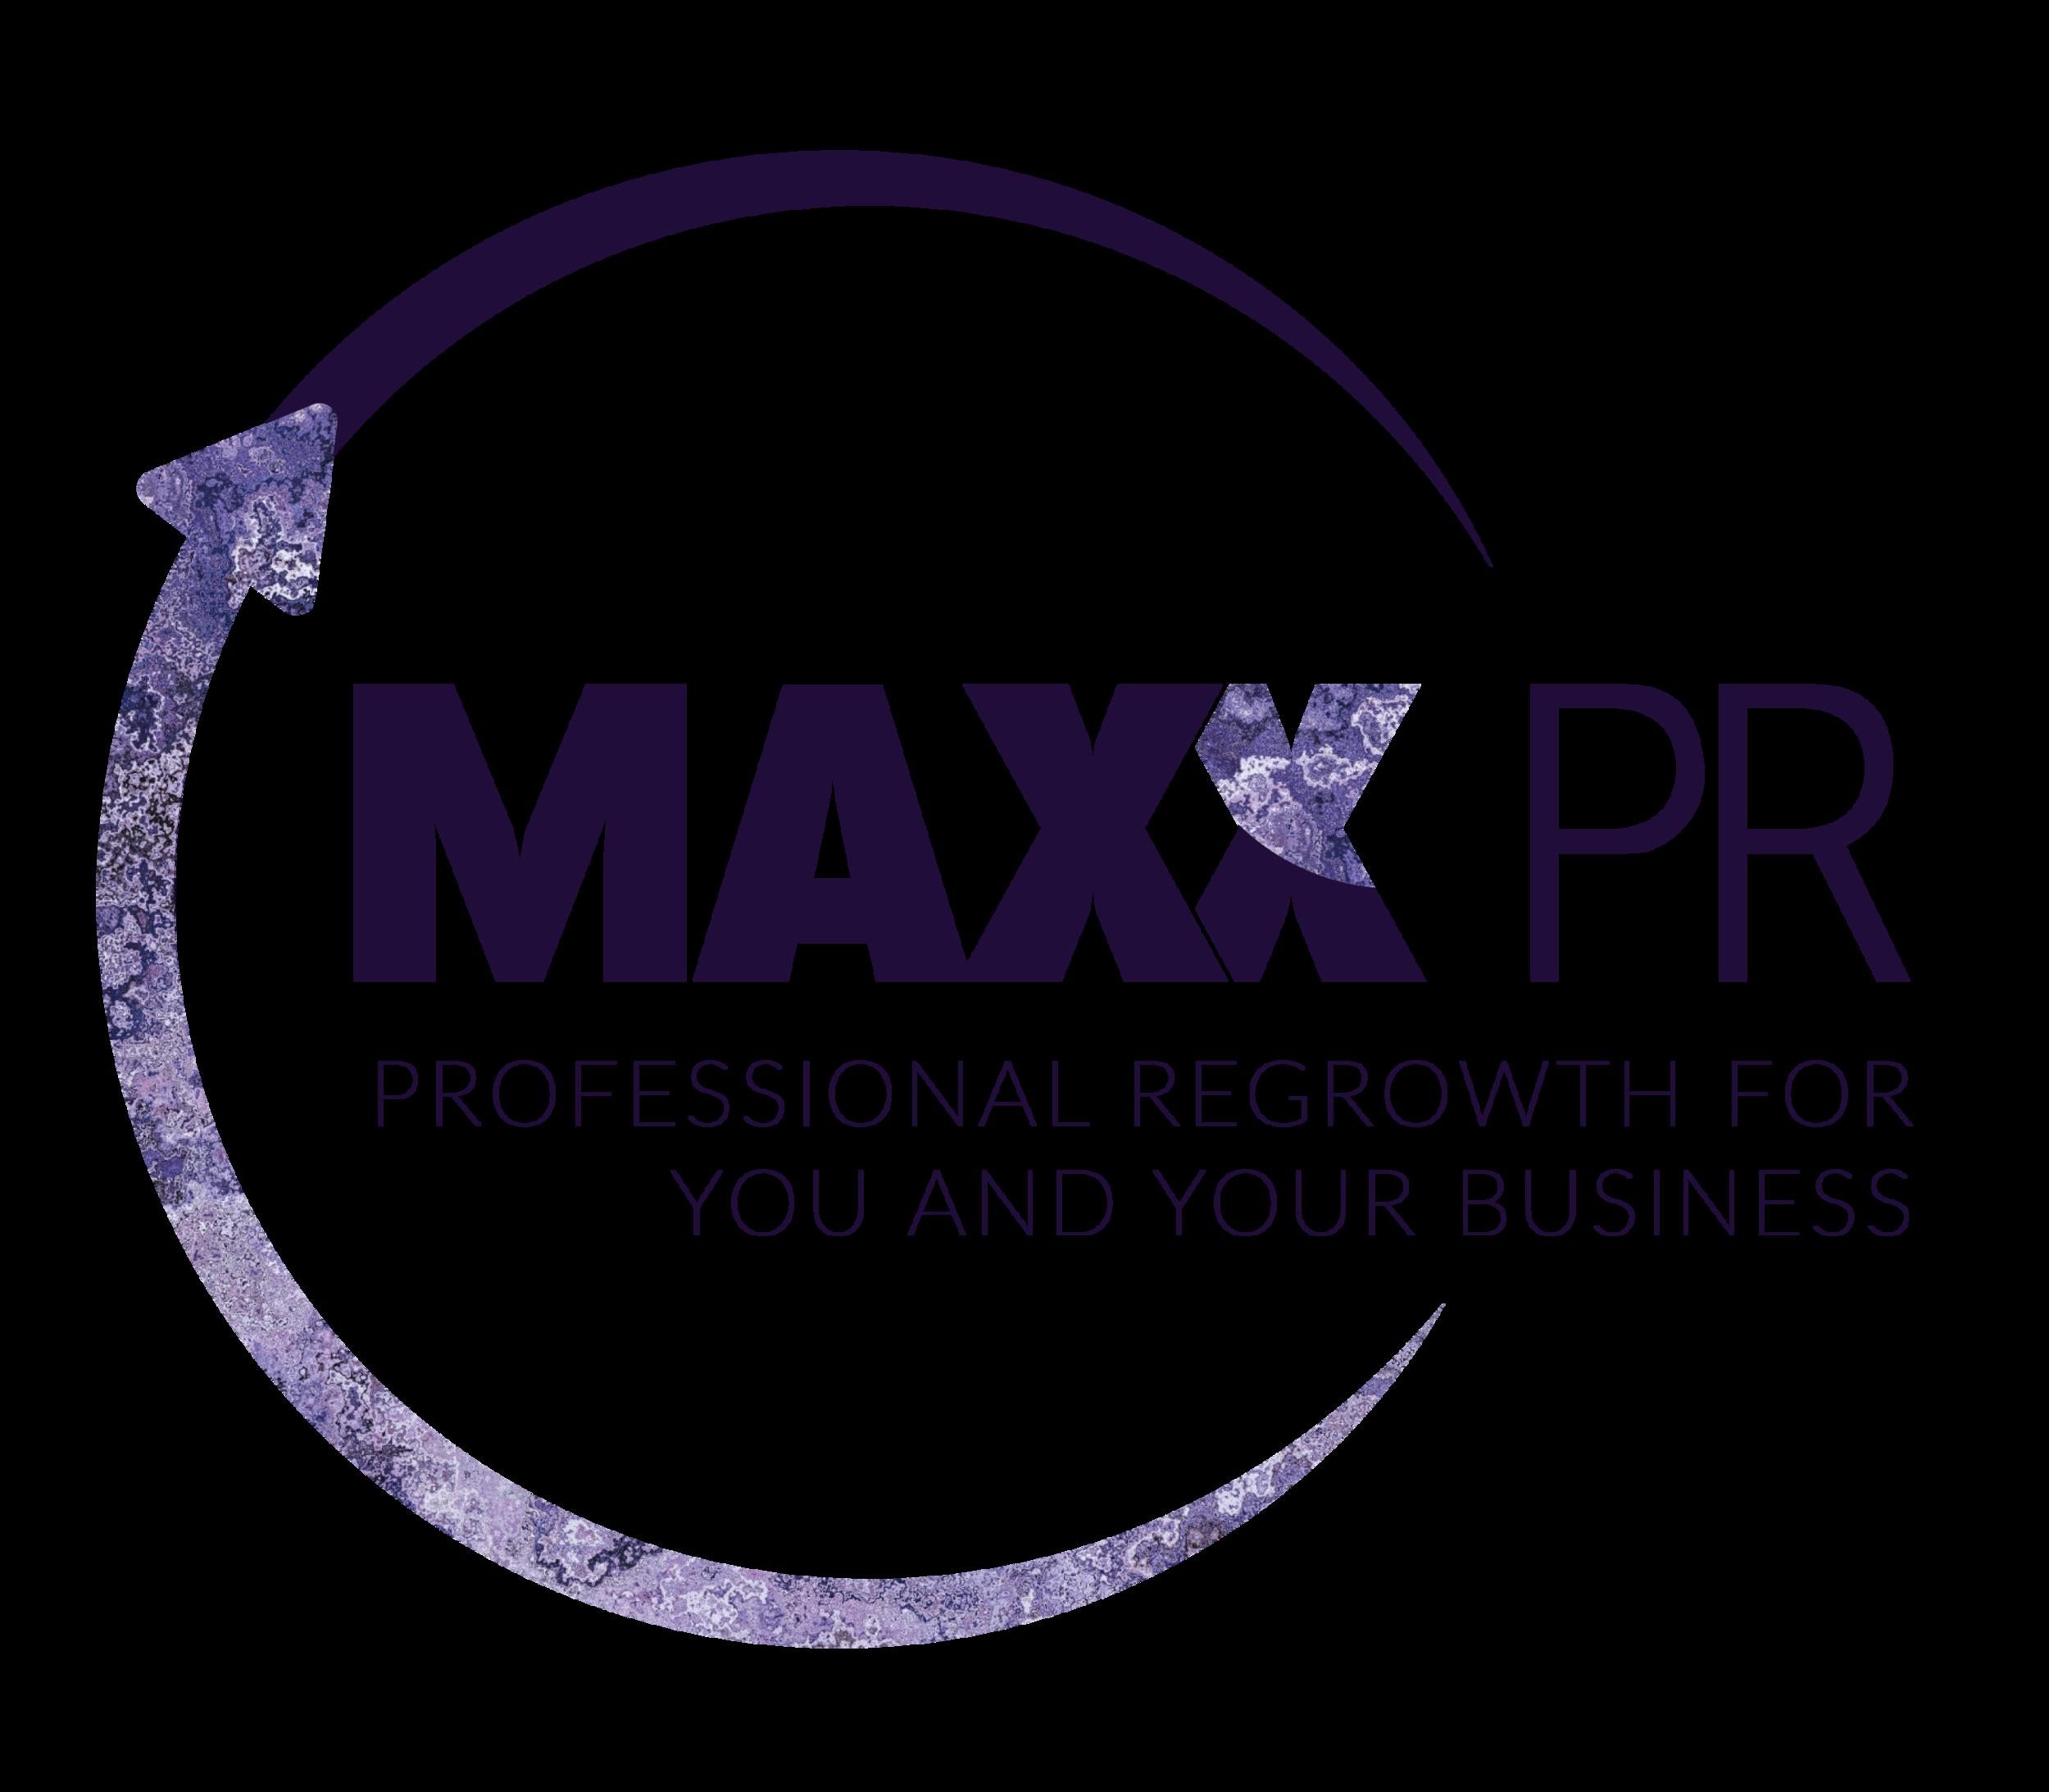 LGO_Maxx_PR_Primary Logo - Texture.png